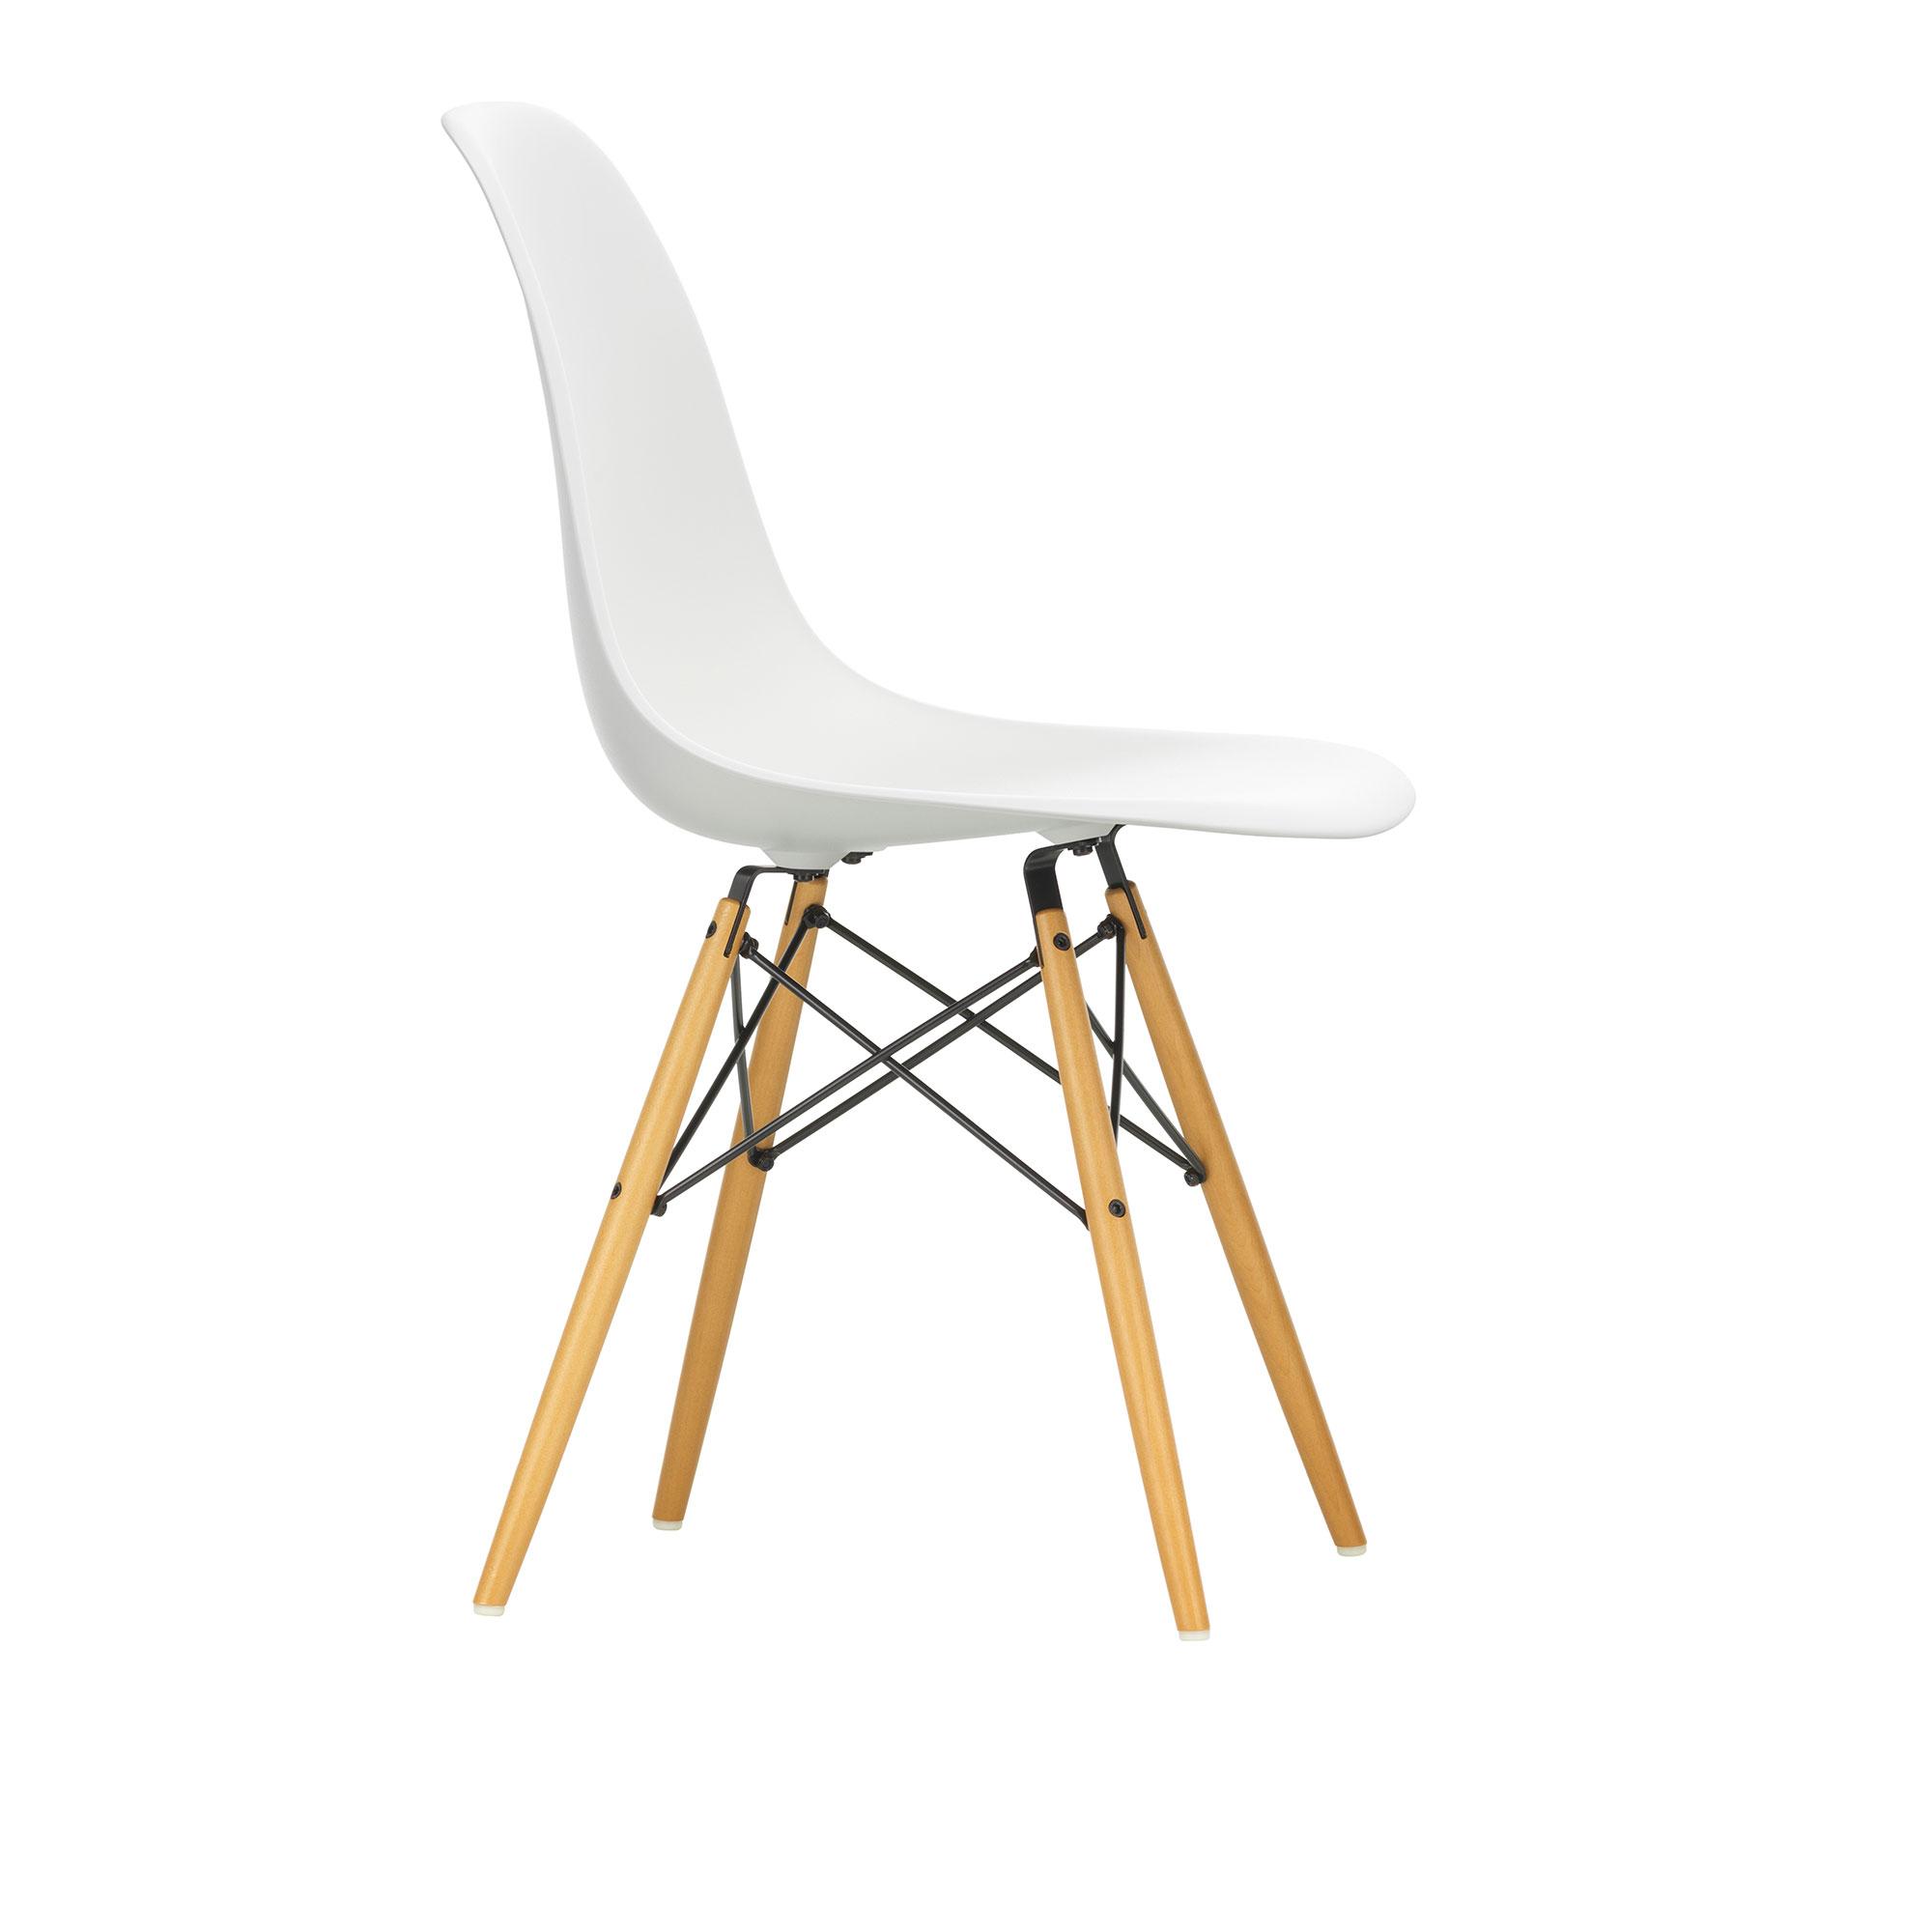 K 246 P Eames Plastic Chair Dsw Fr 229 N Vitra Nordiska Galleriet